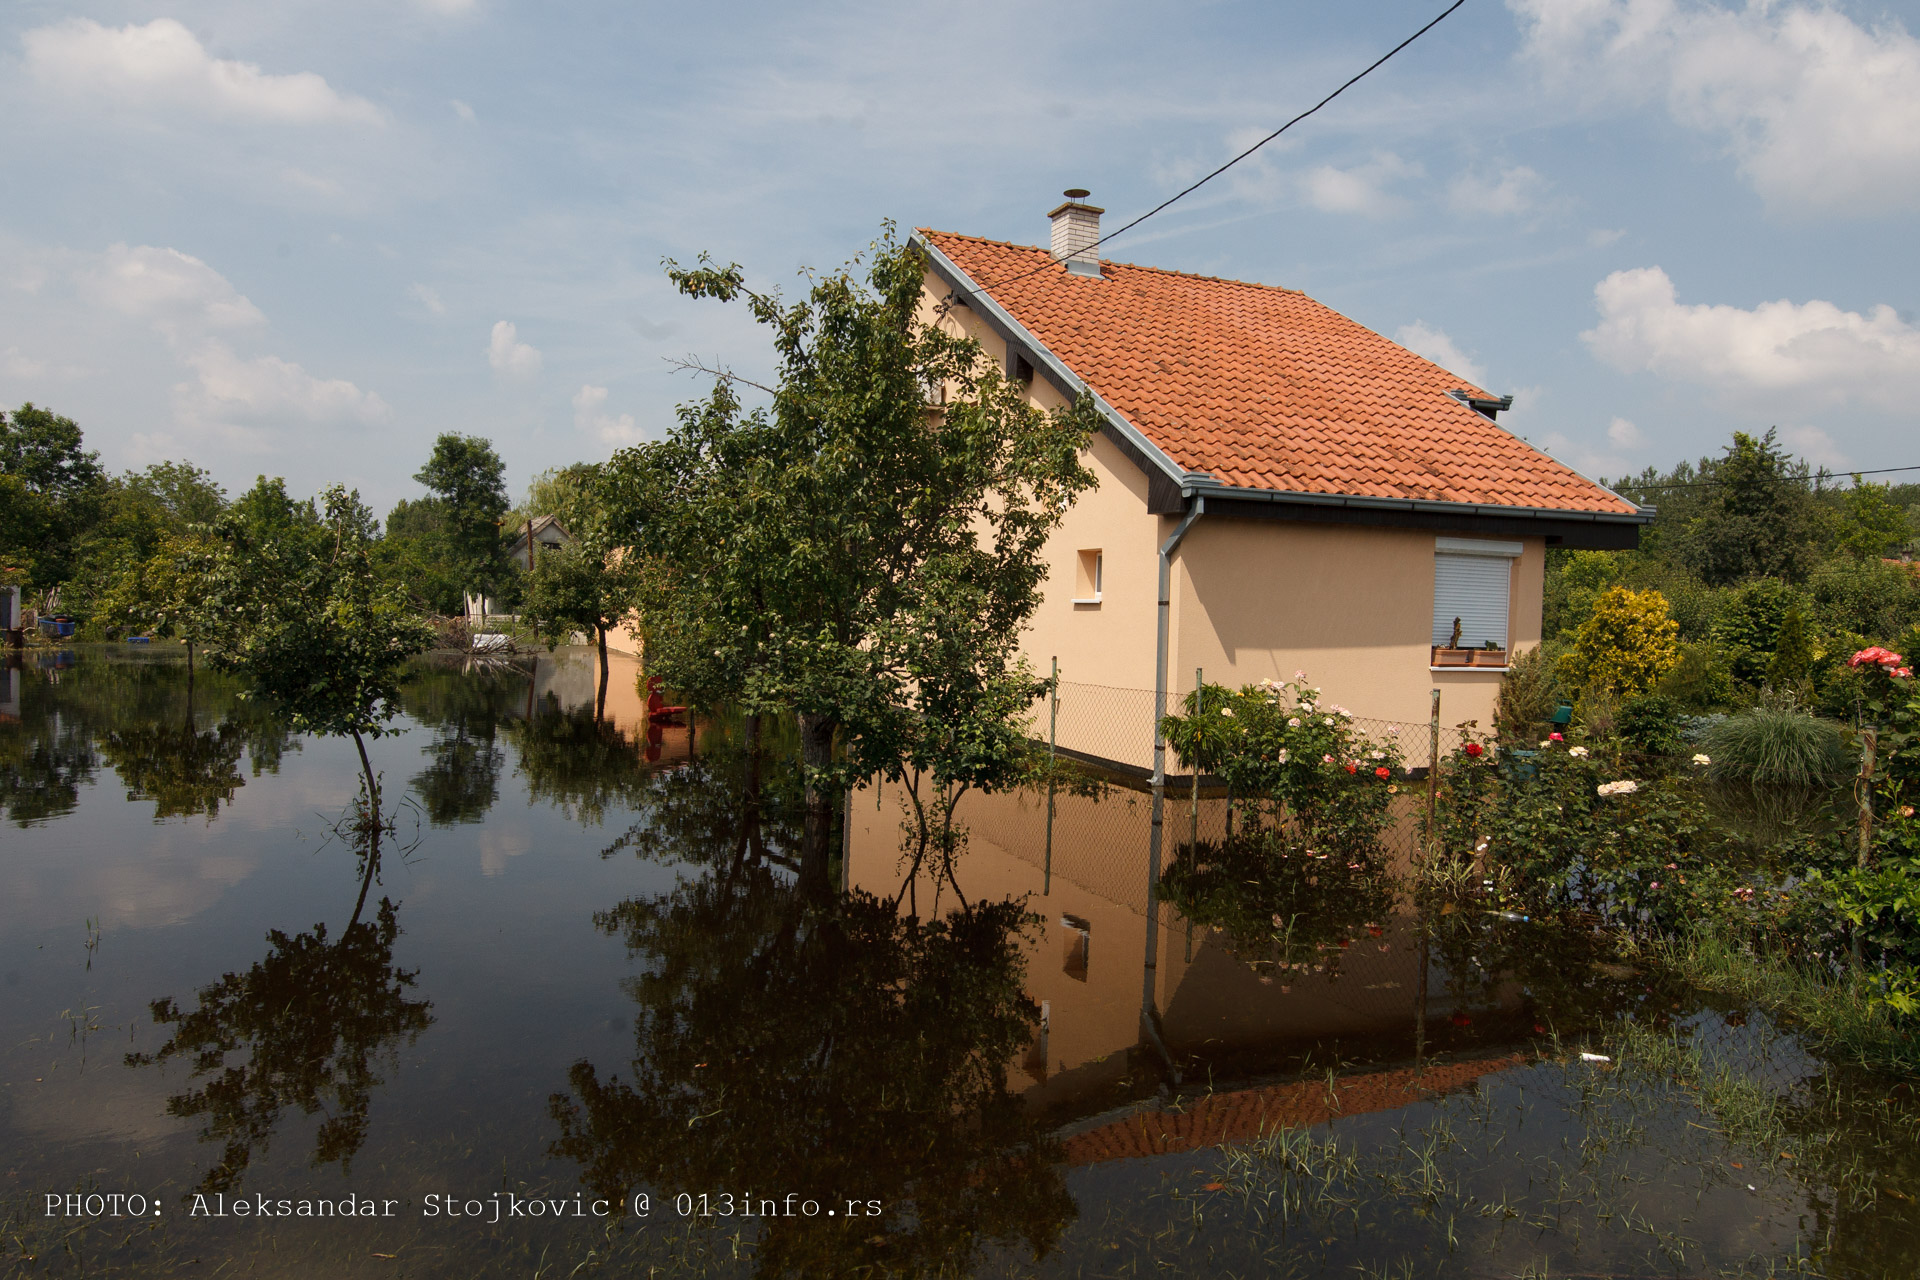 Poplava u Dubokoj Bari